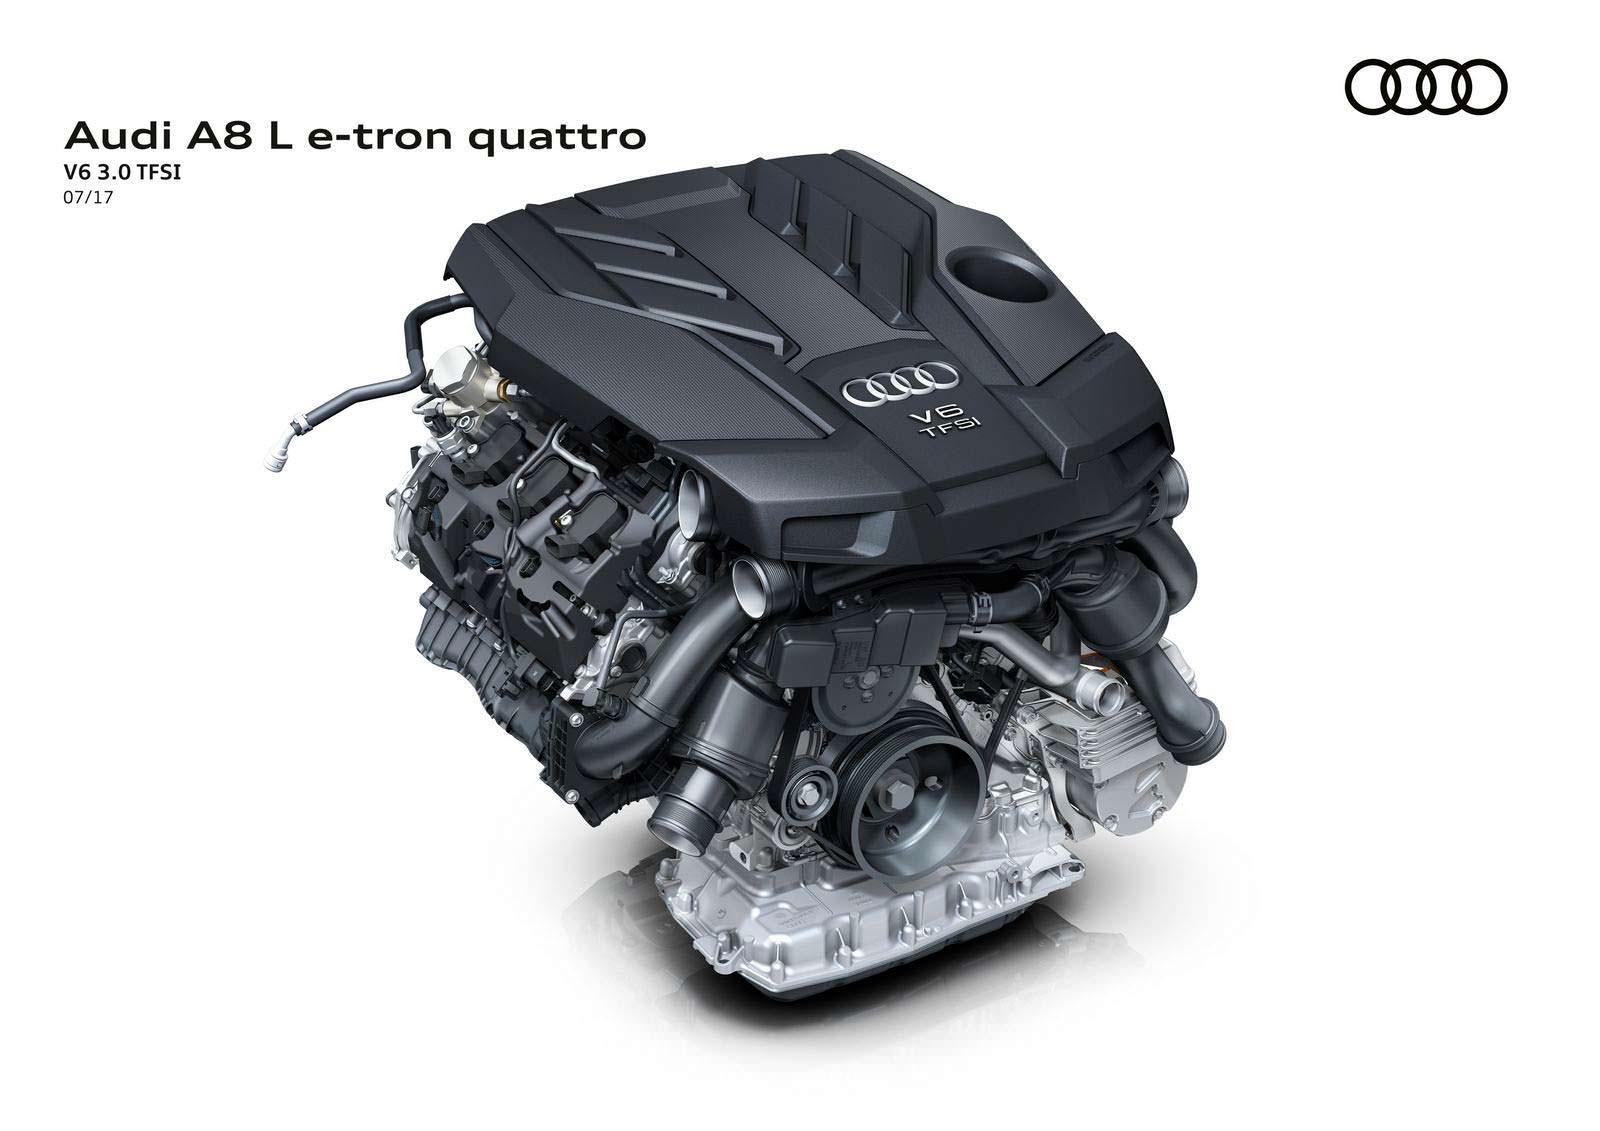 Гибридная силовая установка Audi A8 L e-tron quattro